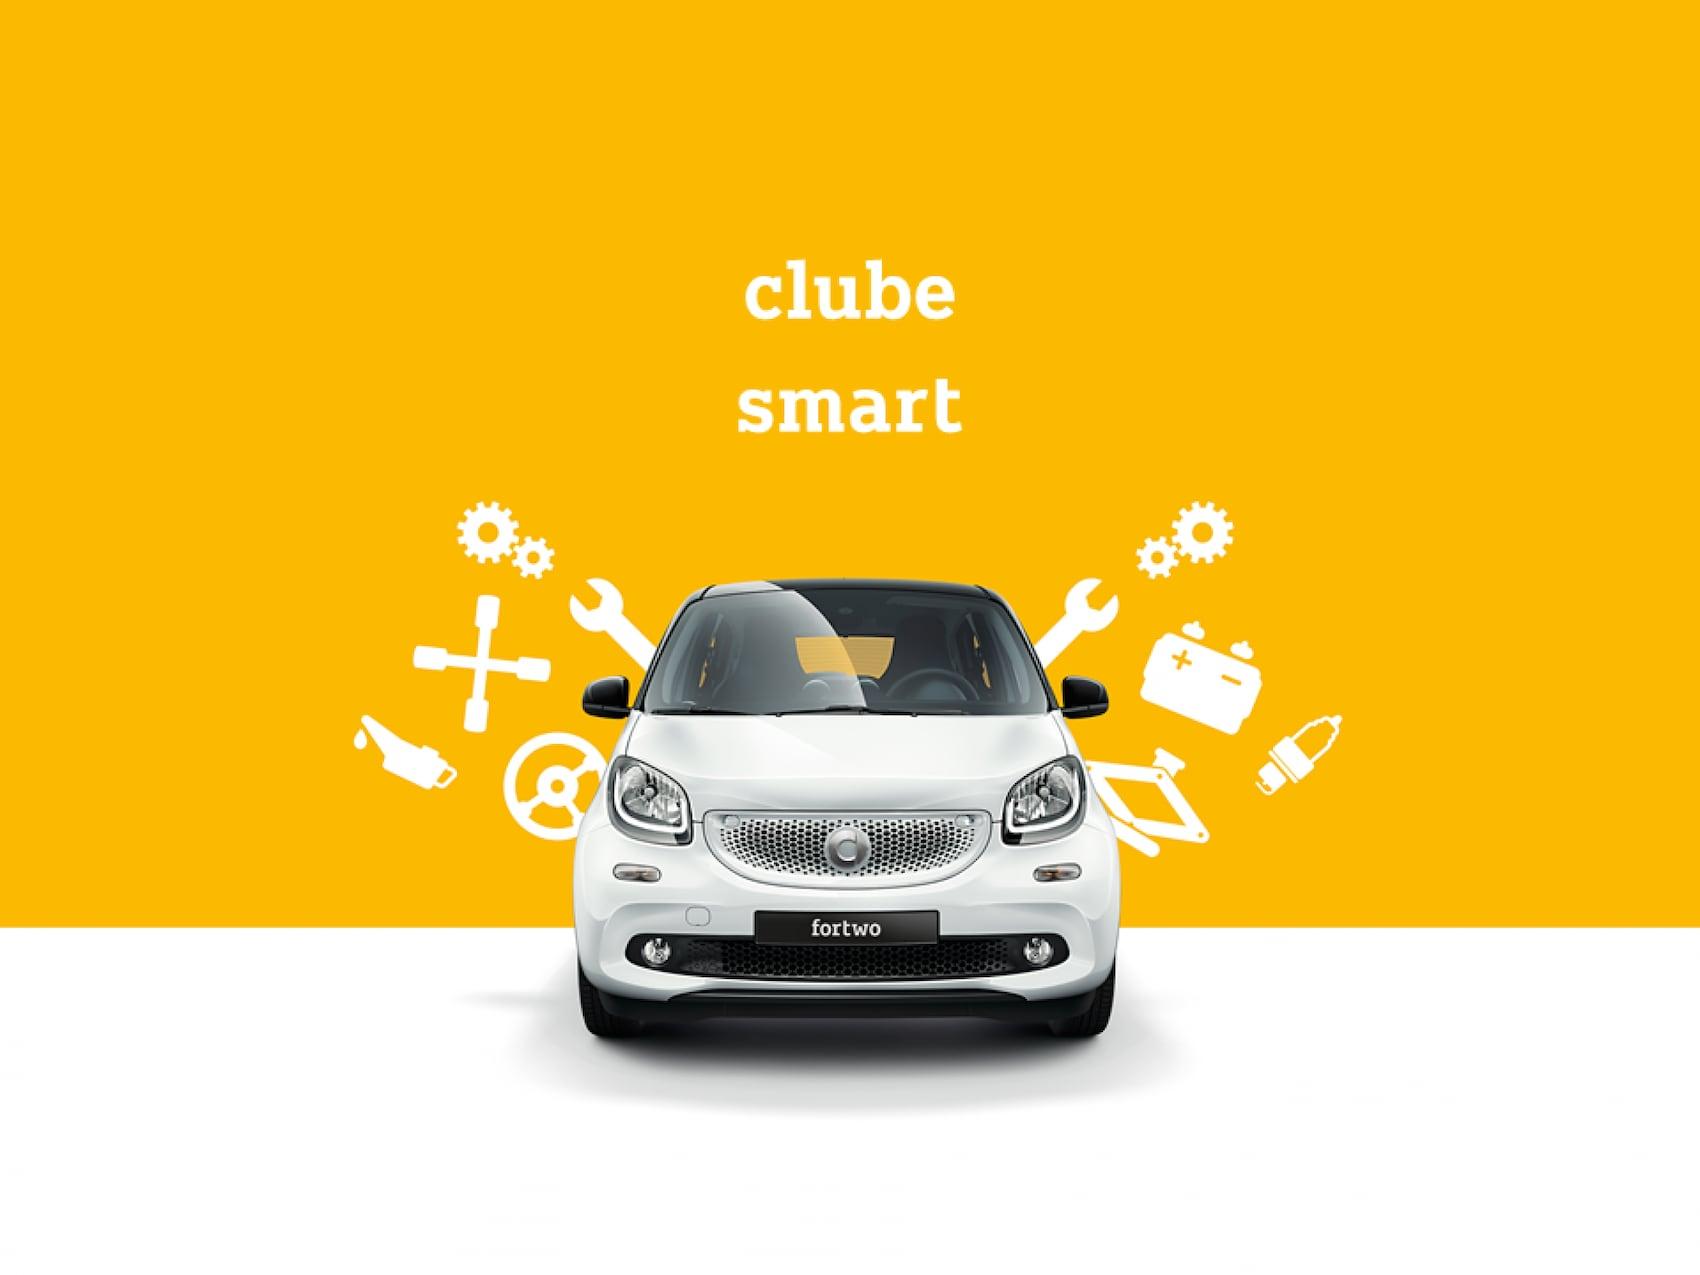 clube smart